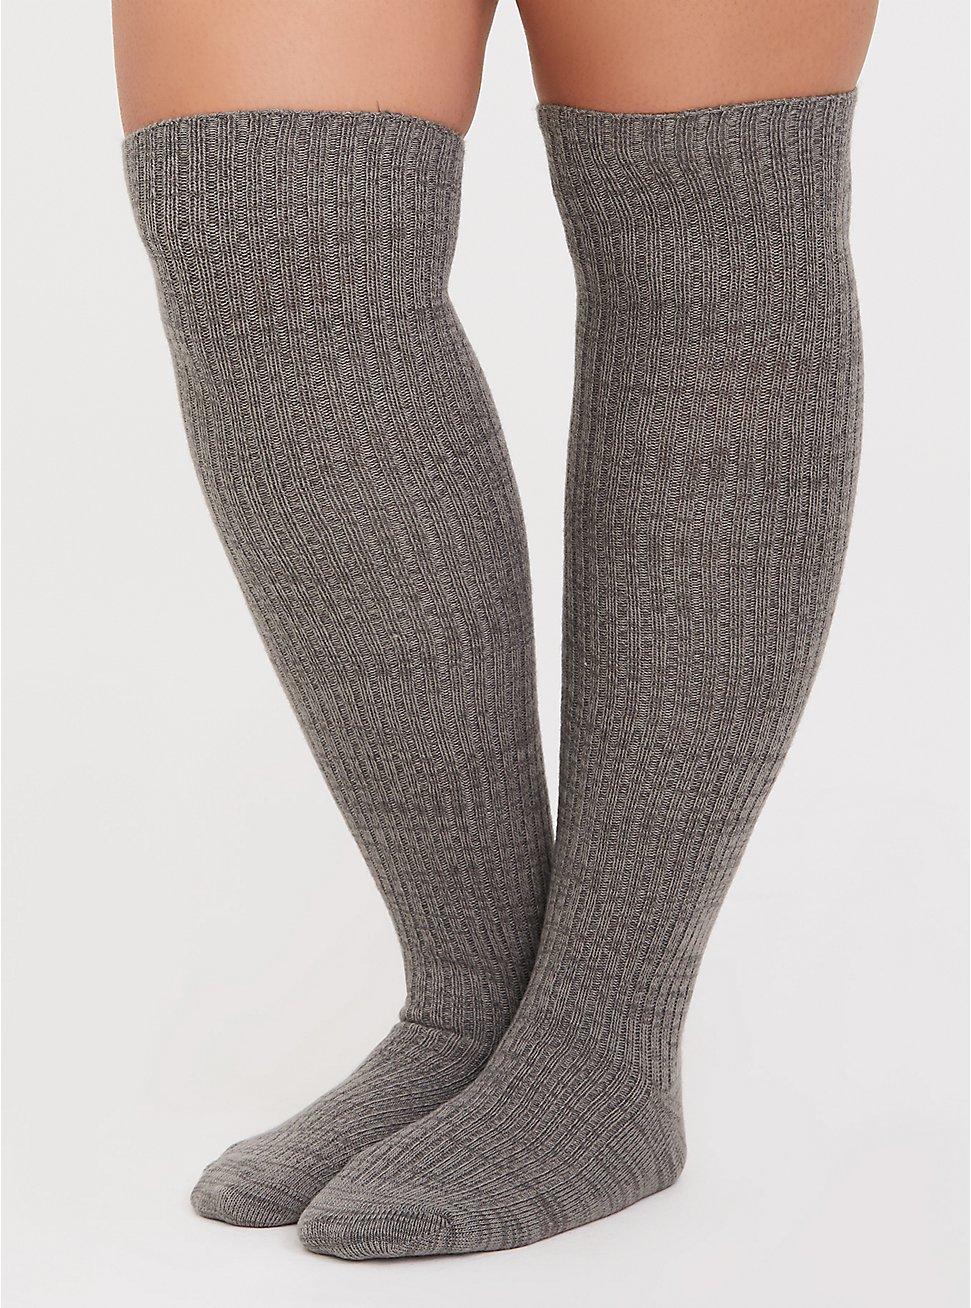 Grey Over-the-Knee Sock Pack - Pack of 2, MULTI, hi-res